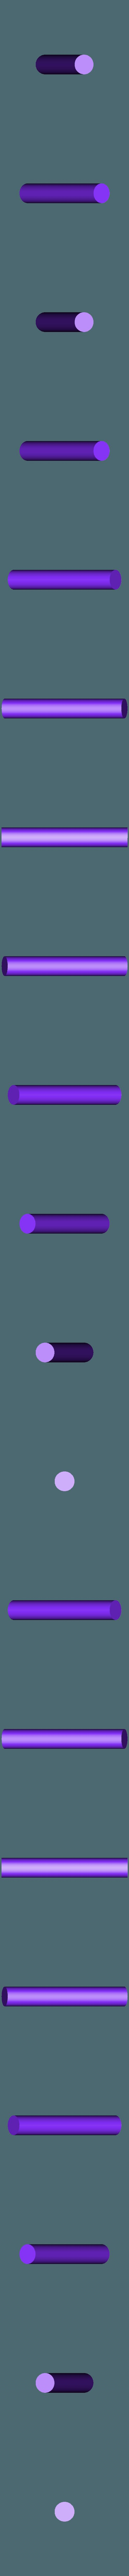 Support_Pipe.stl Télécharger fichier STL gratuit Borderlands Bandit Room Clener Shotgun • Modèle pour impression 3D, Dsk